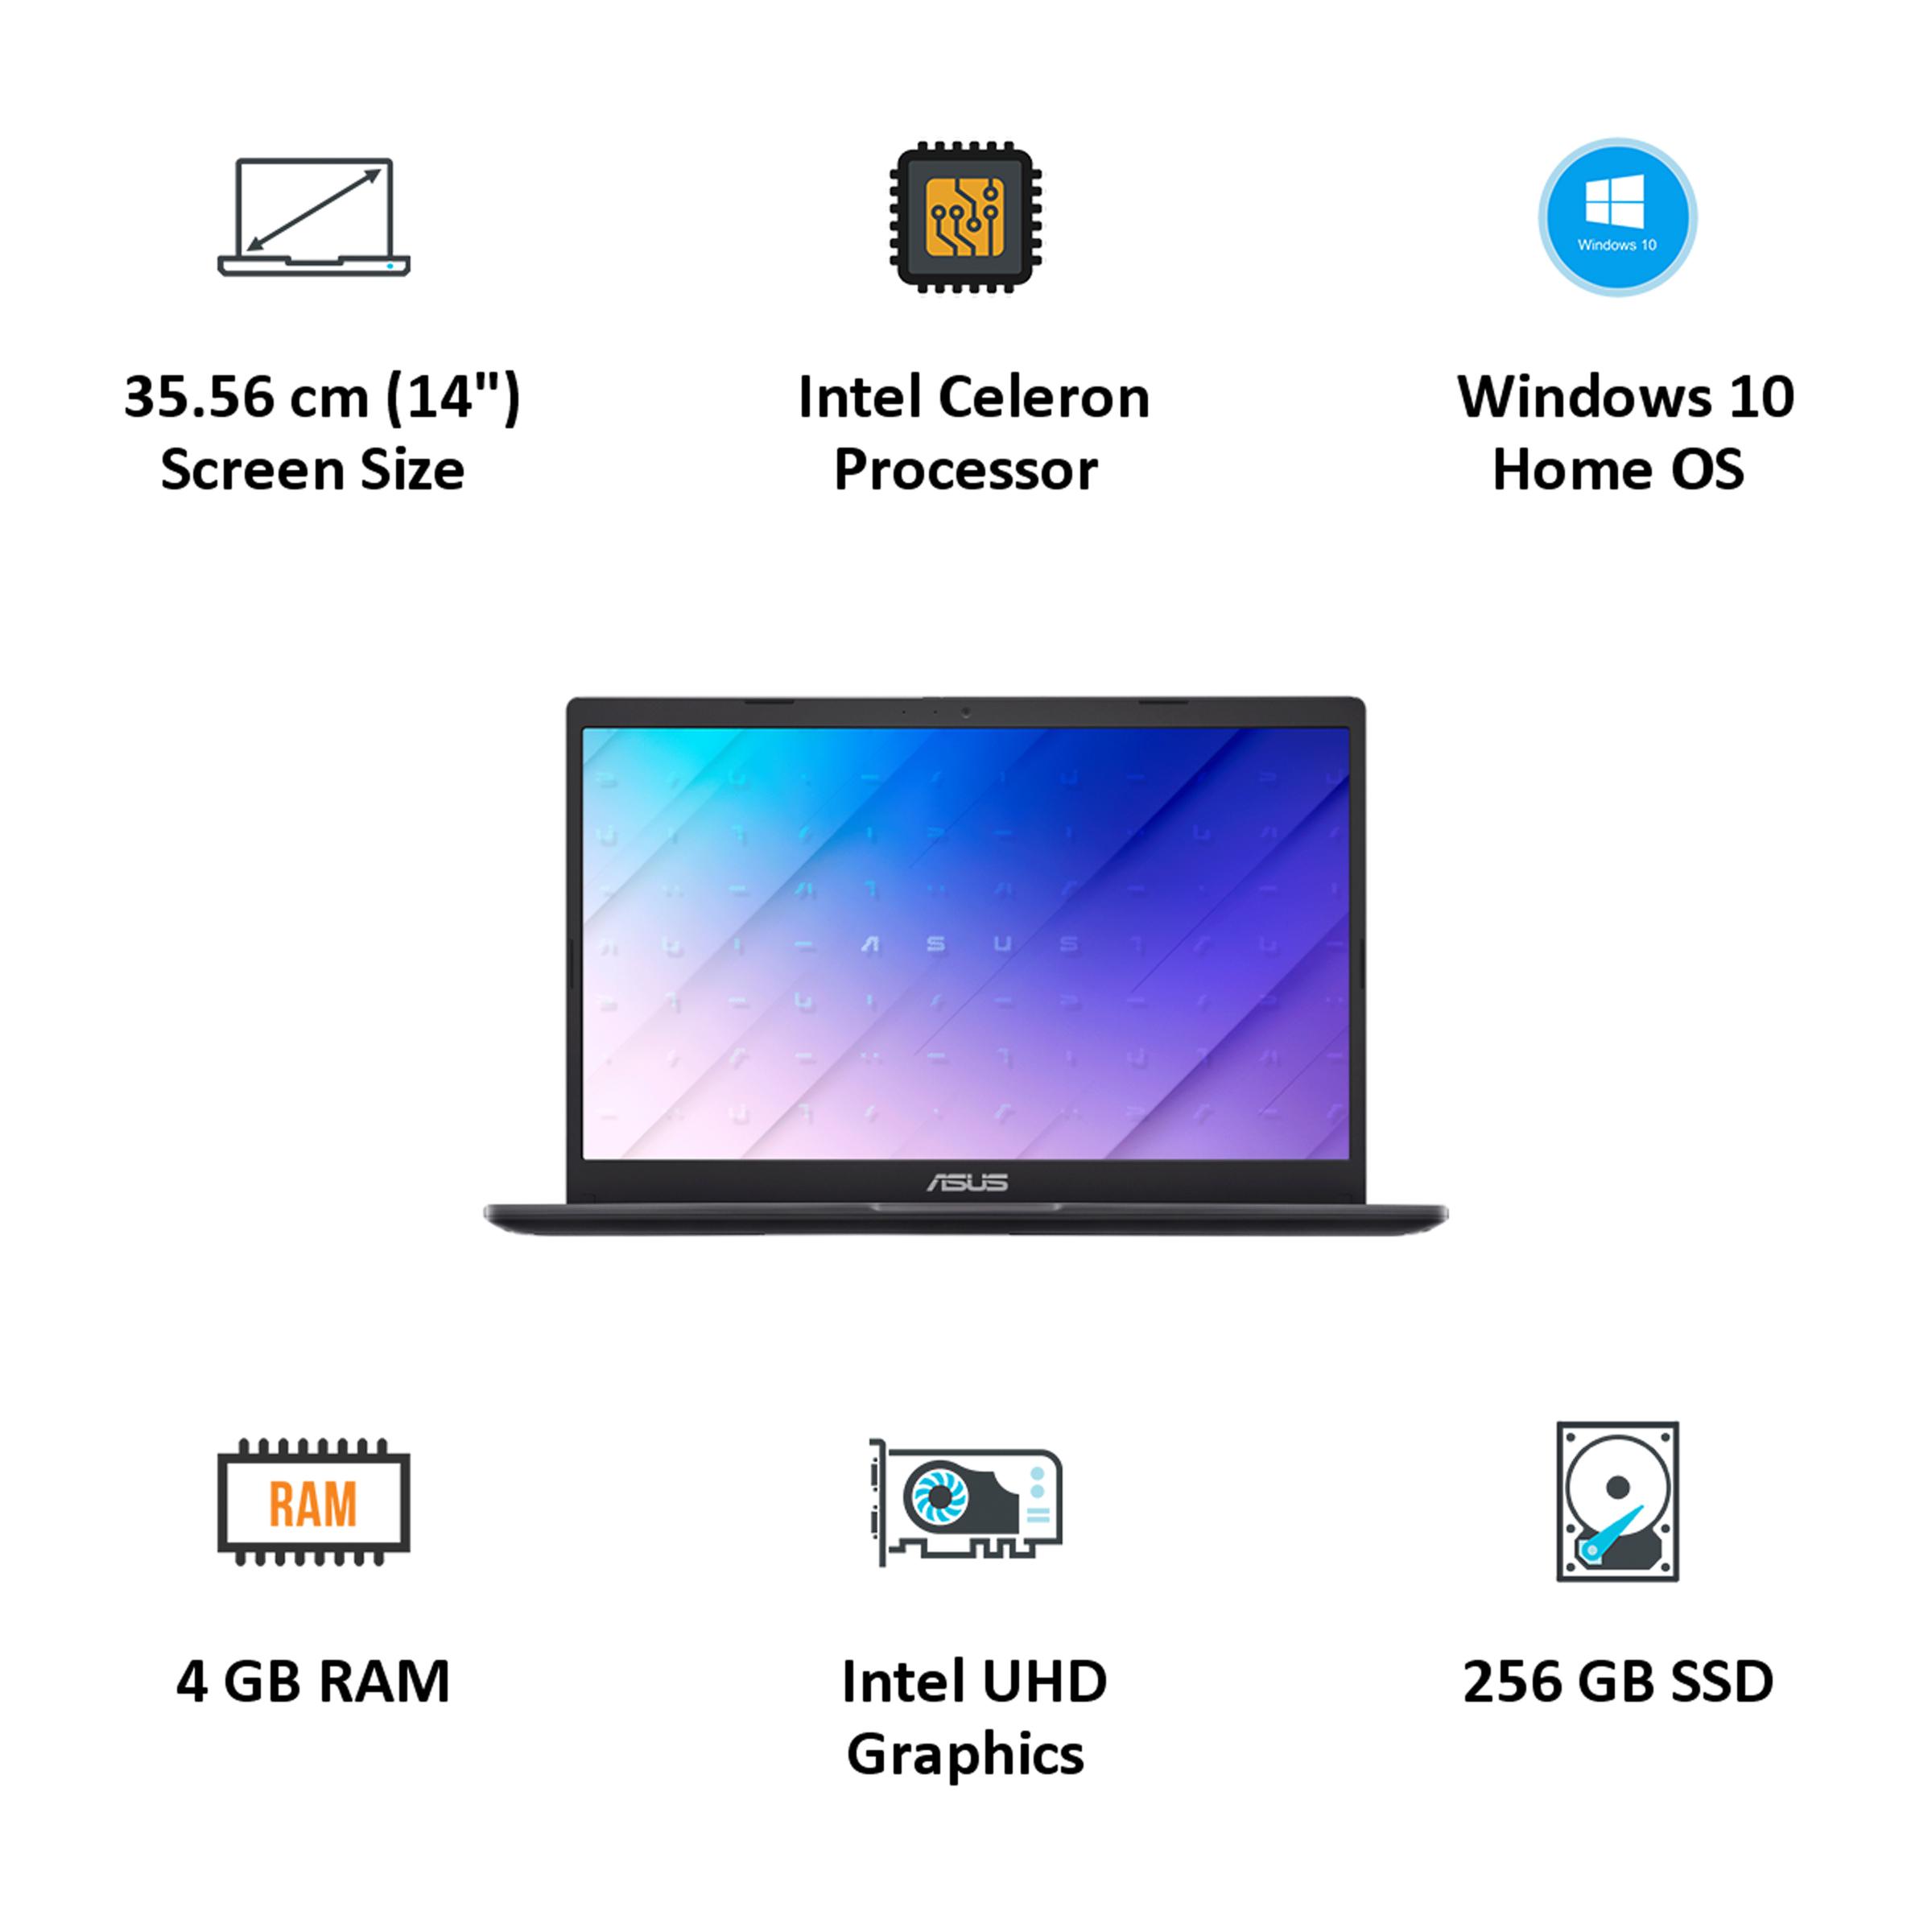 Asus E410MA-EB001T (90NB0Q11-M22940) Celeron Windows 10 Home Laptop (4GB RAM, 256GB SSD, Intel UHD Graphics 600, 35.56cm, Peacock Blue) 5